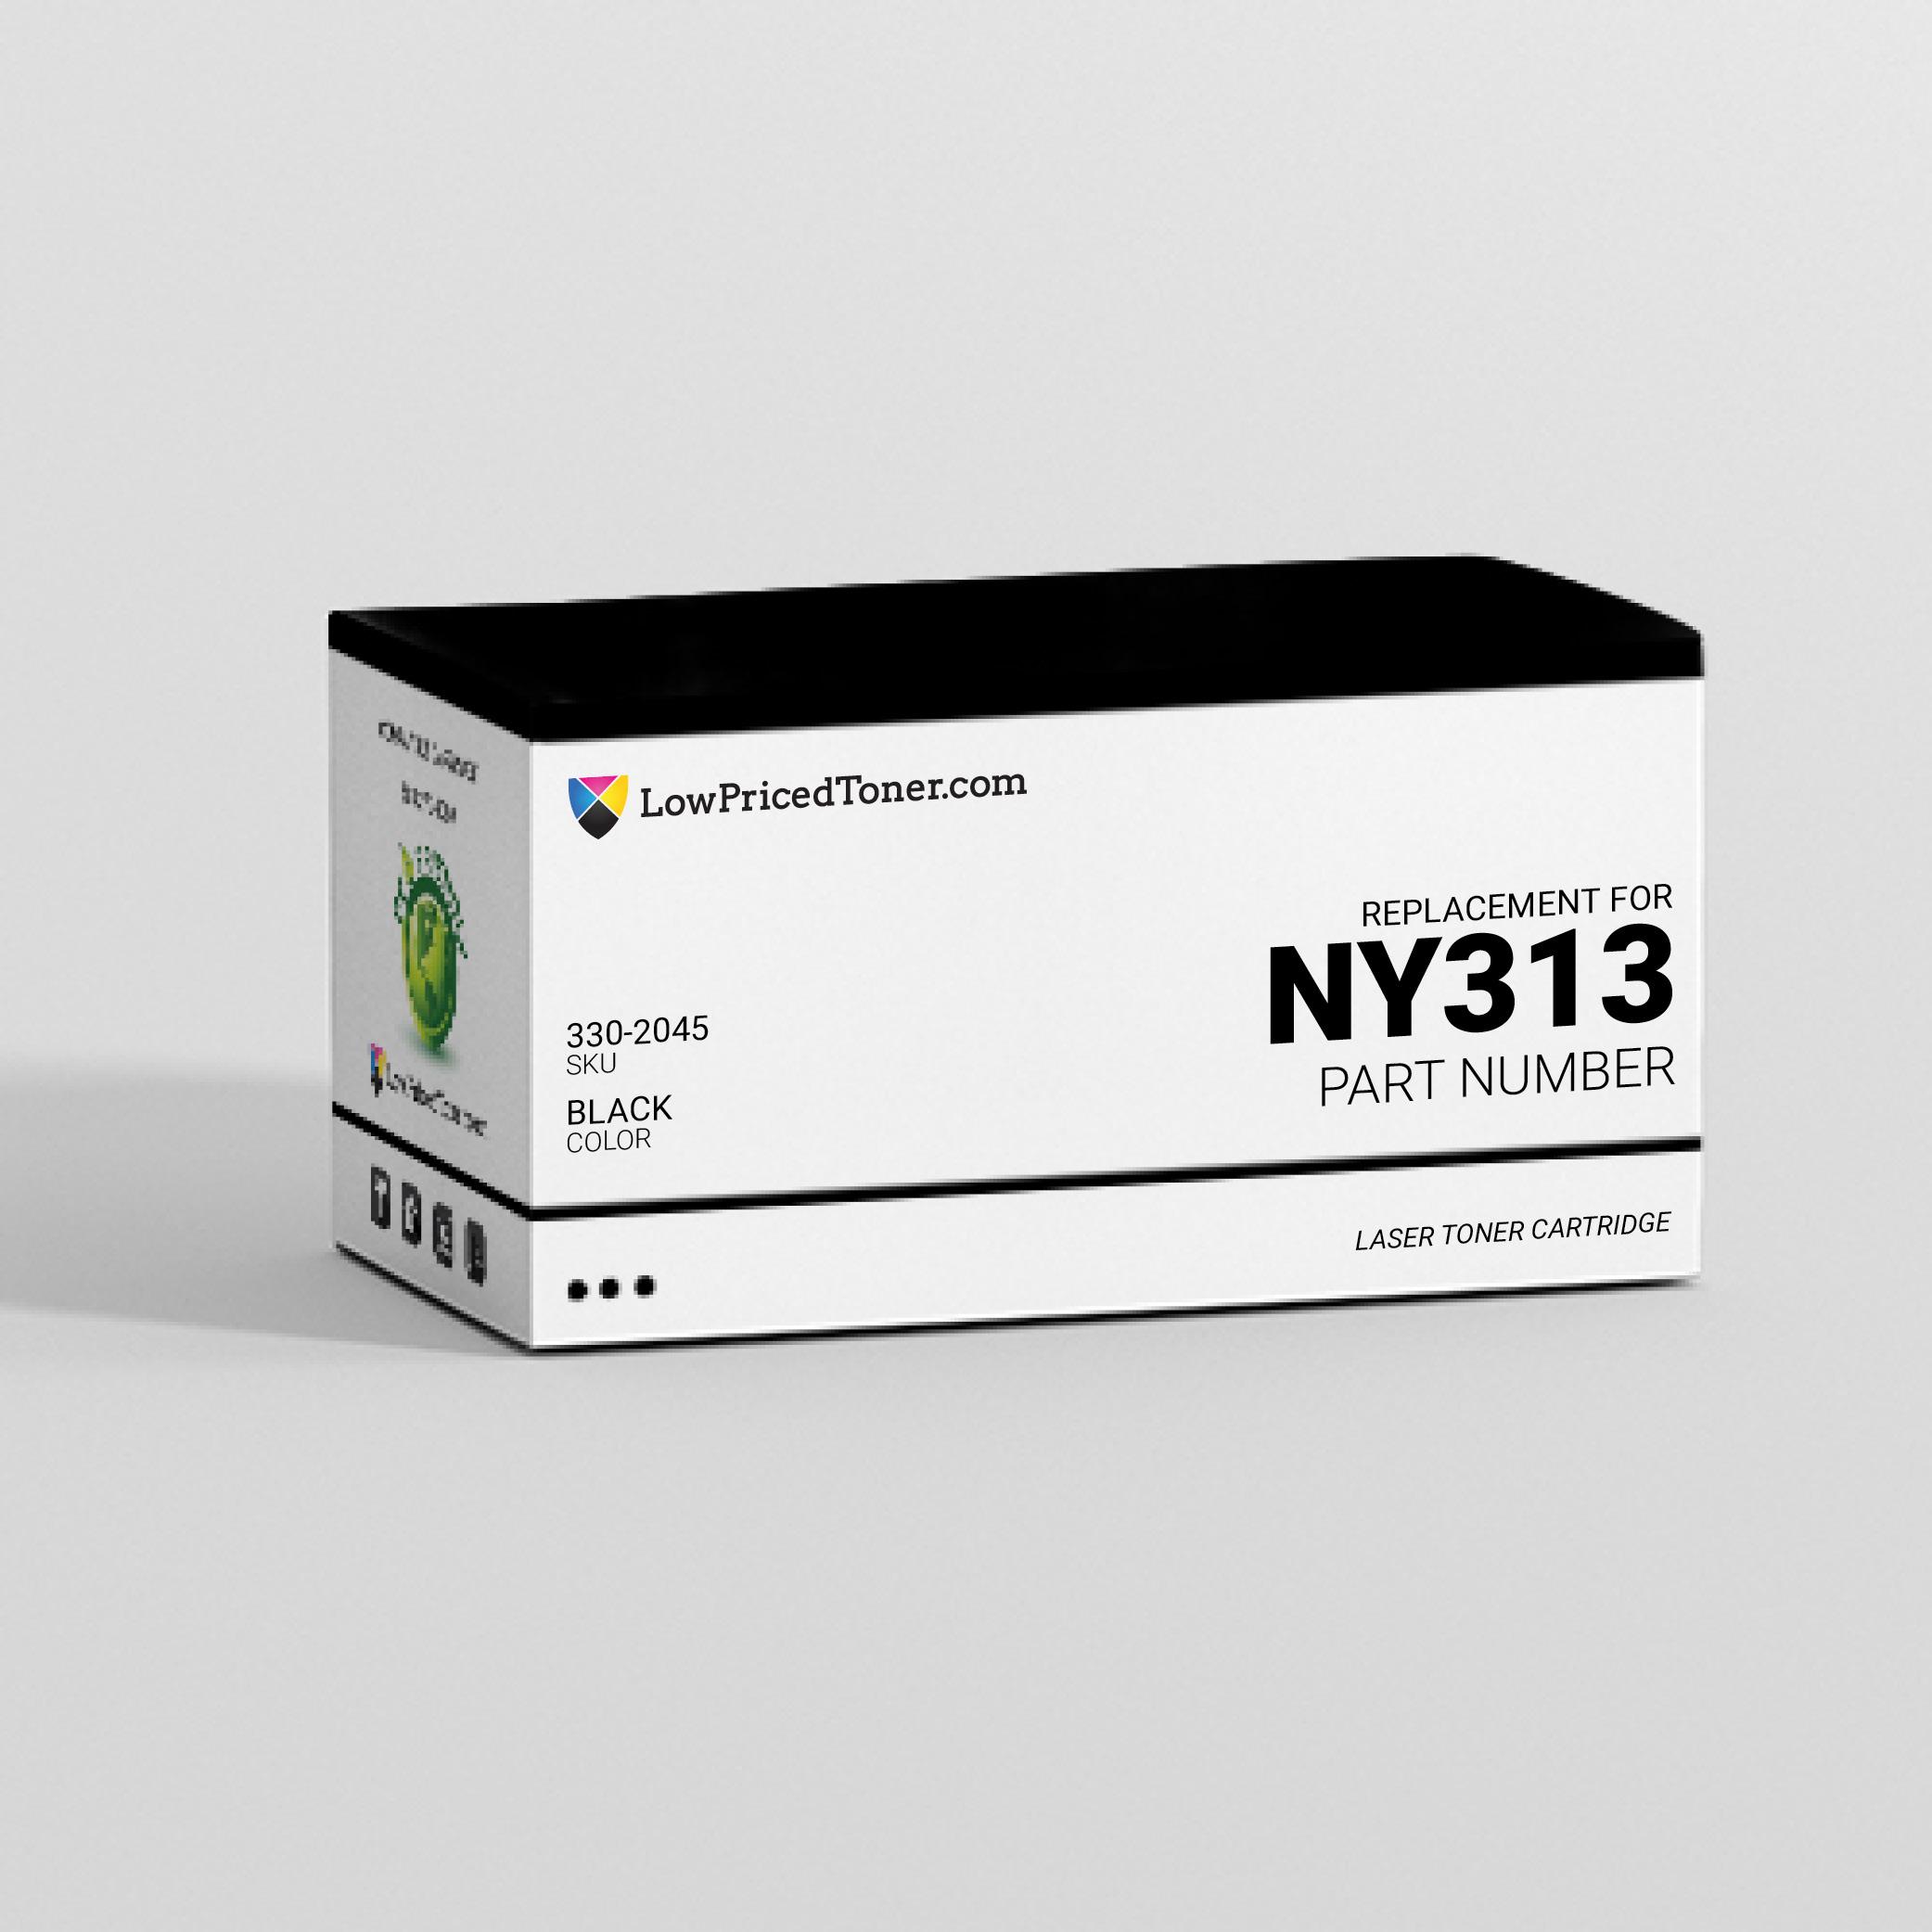 Dell 330-2045 NY313 Compatible Black Laser Toner Cartridge